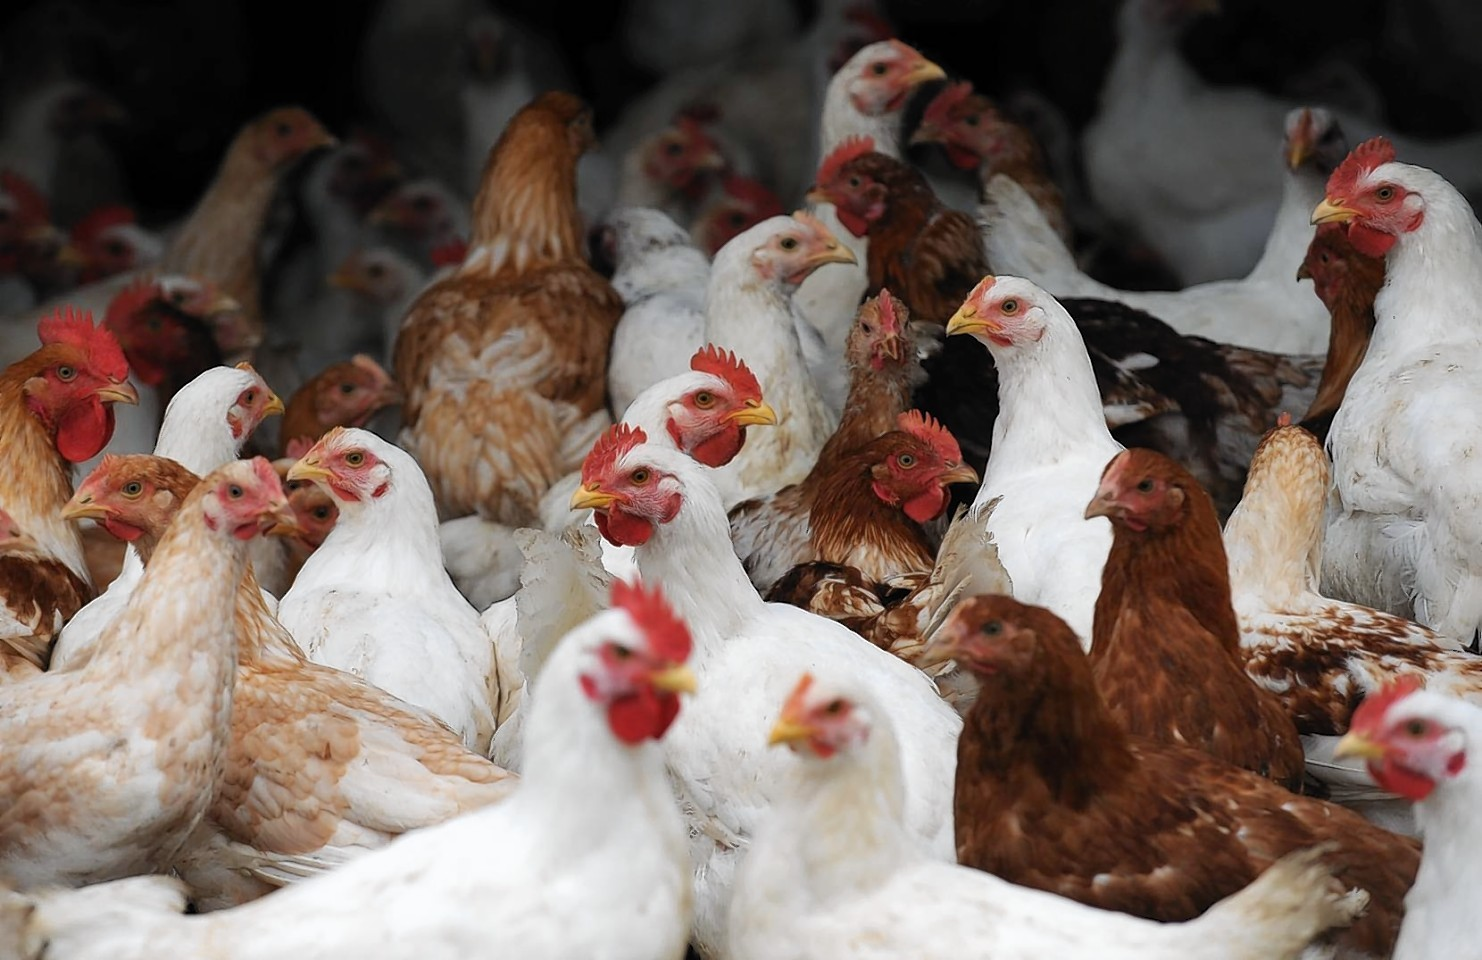 Stock photo: Chickens